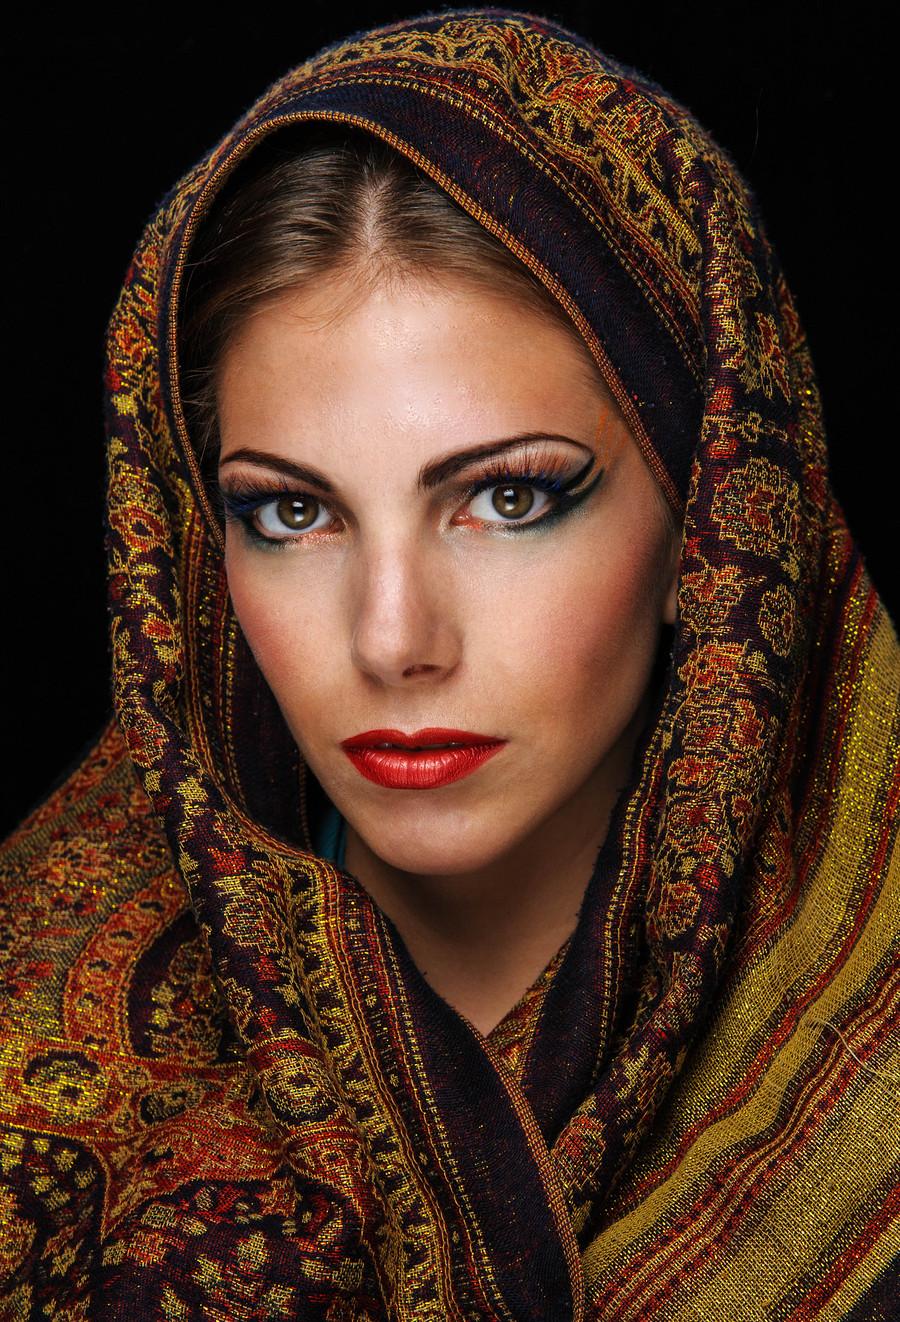 Arabic look / Photography by Blower.photos, Model April K, Makeup by HardimaN, Stylist HardimaN, Hair styling by HardimaN / Uploaded 29th July 2013 @ 08:26 PM